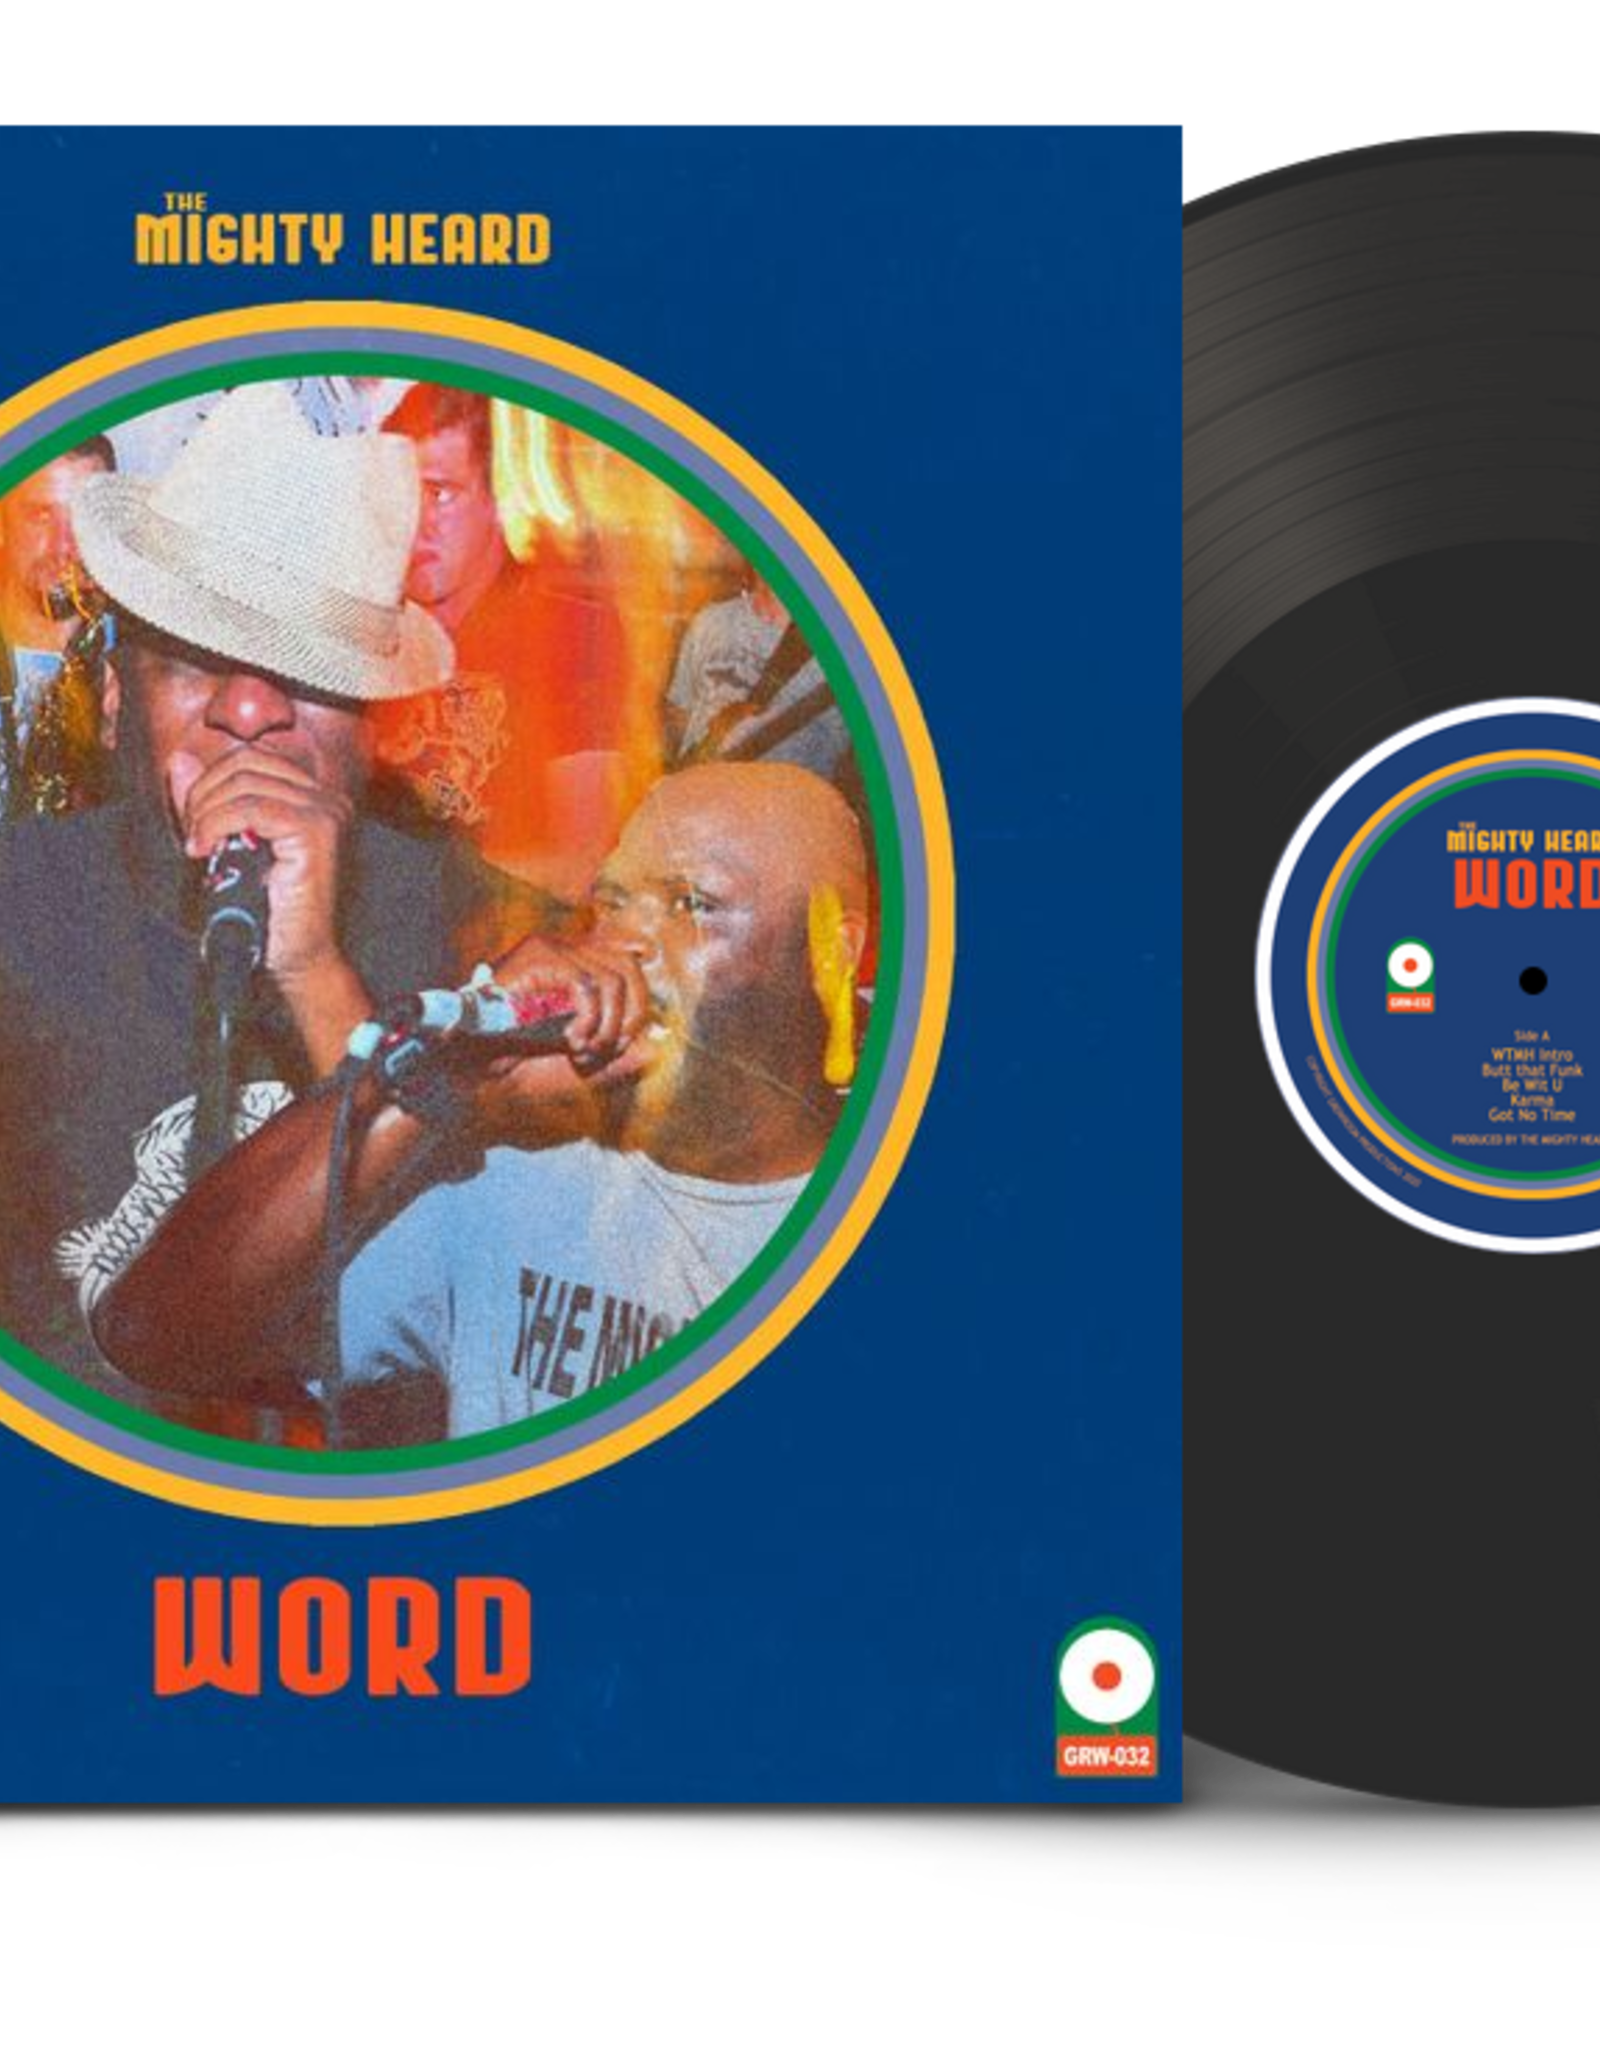 The Mighty Heard - Word